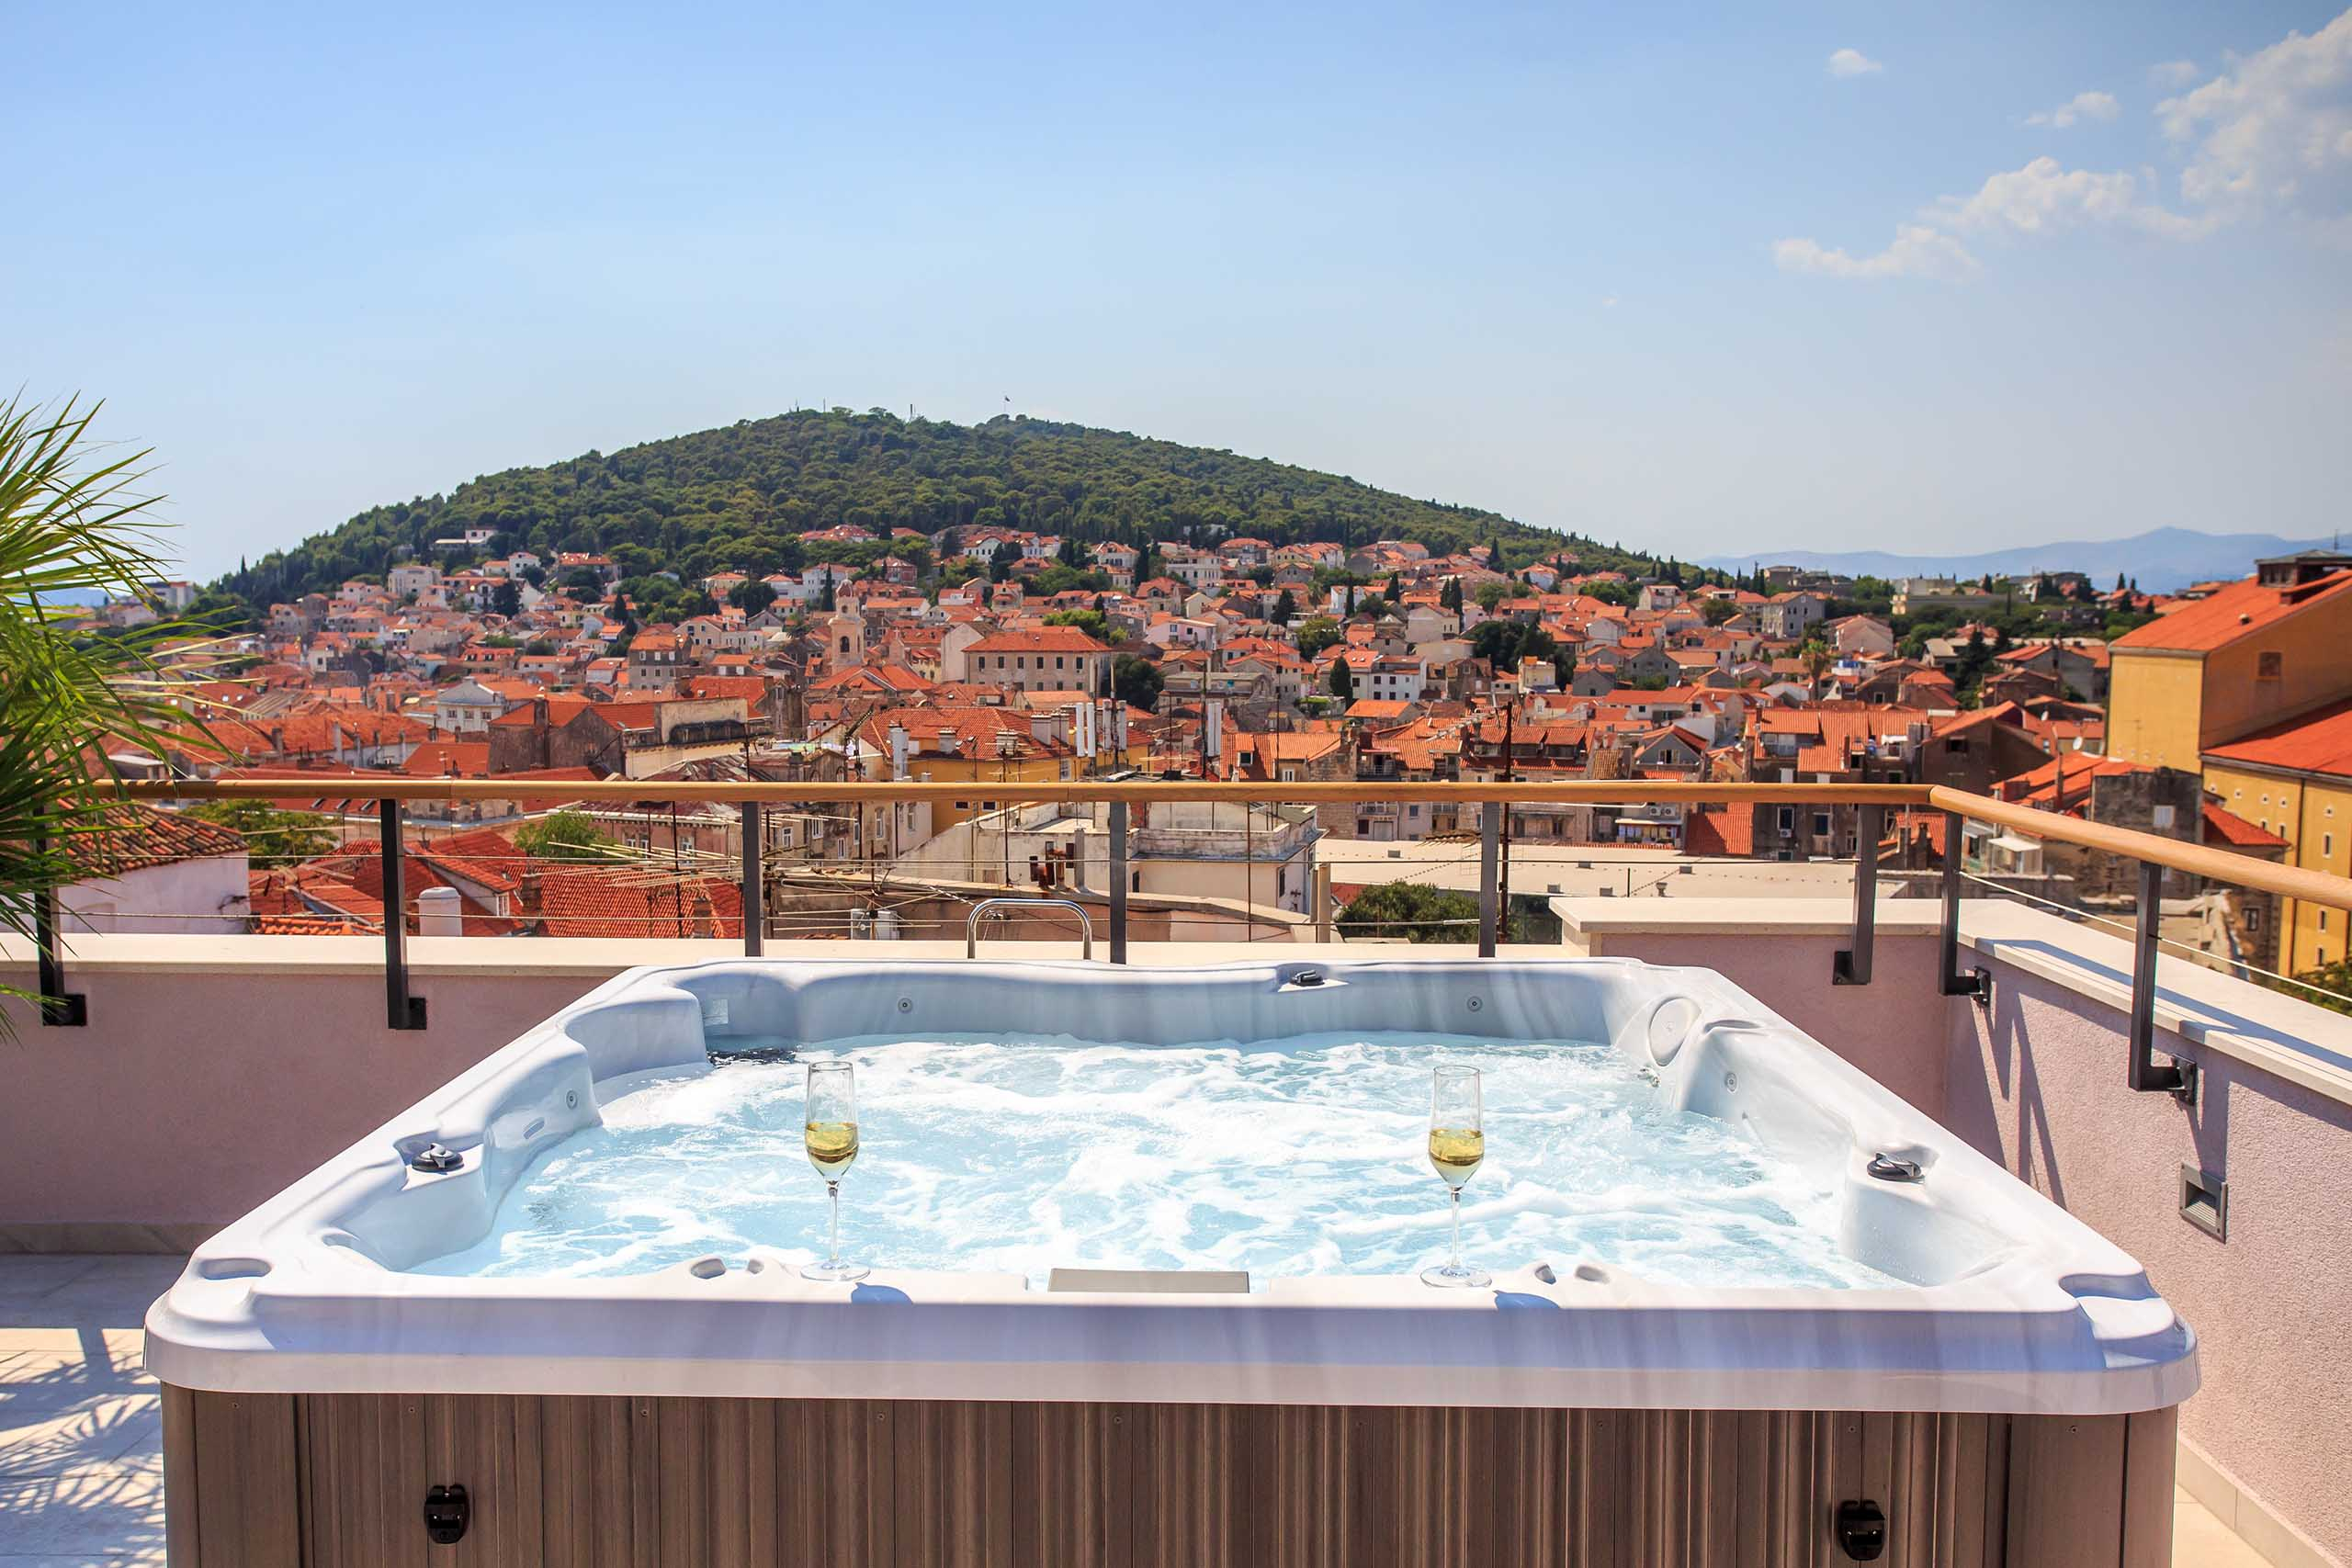 [PHOTOS] Newly Renovated Luxury Hotel Cornaro in Split